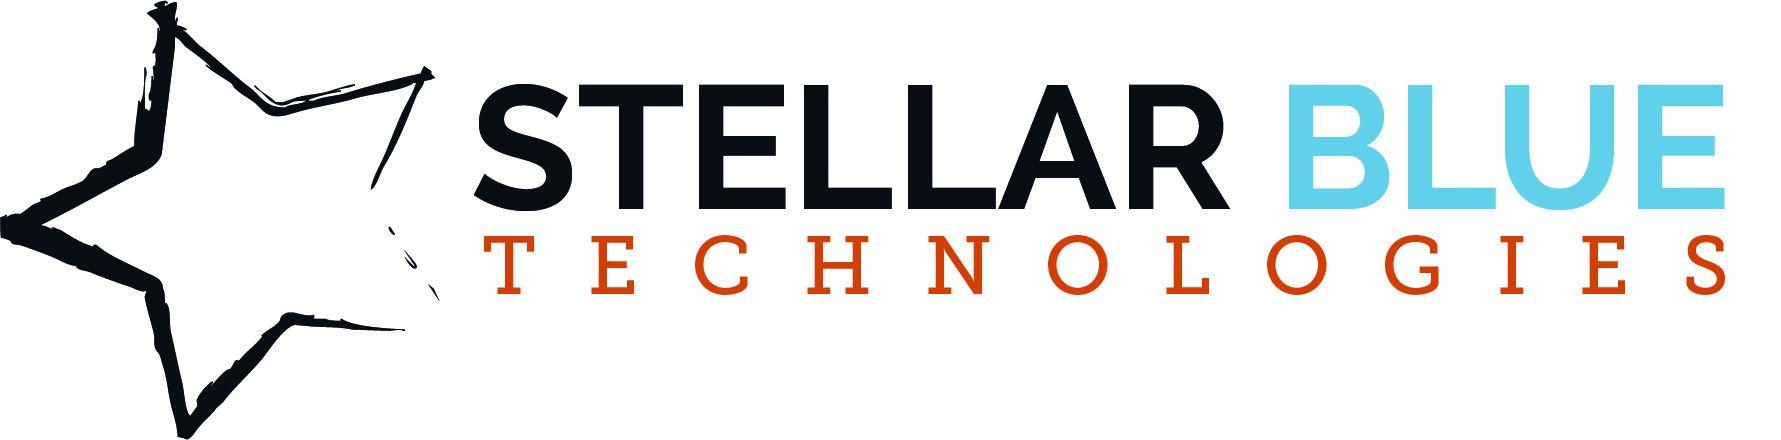 Stellar Blue Technologies Logo